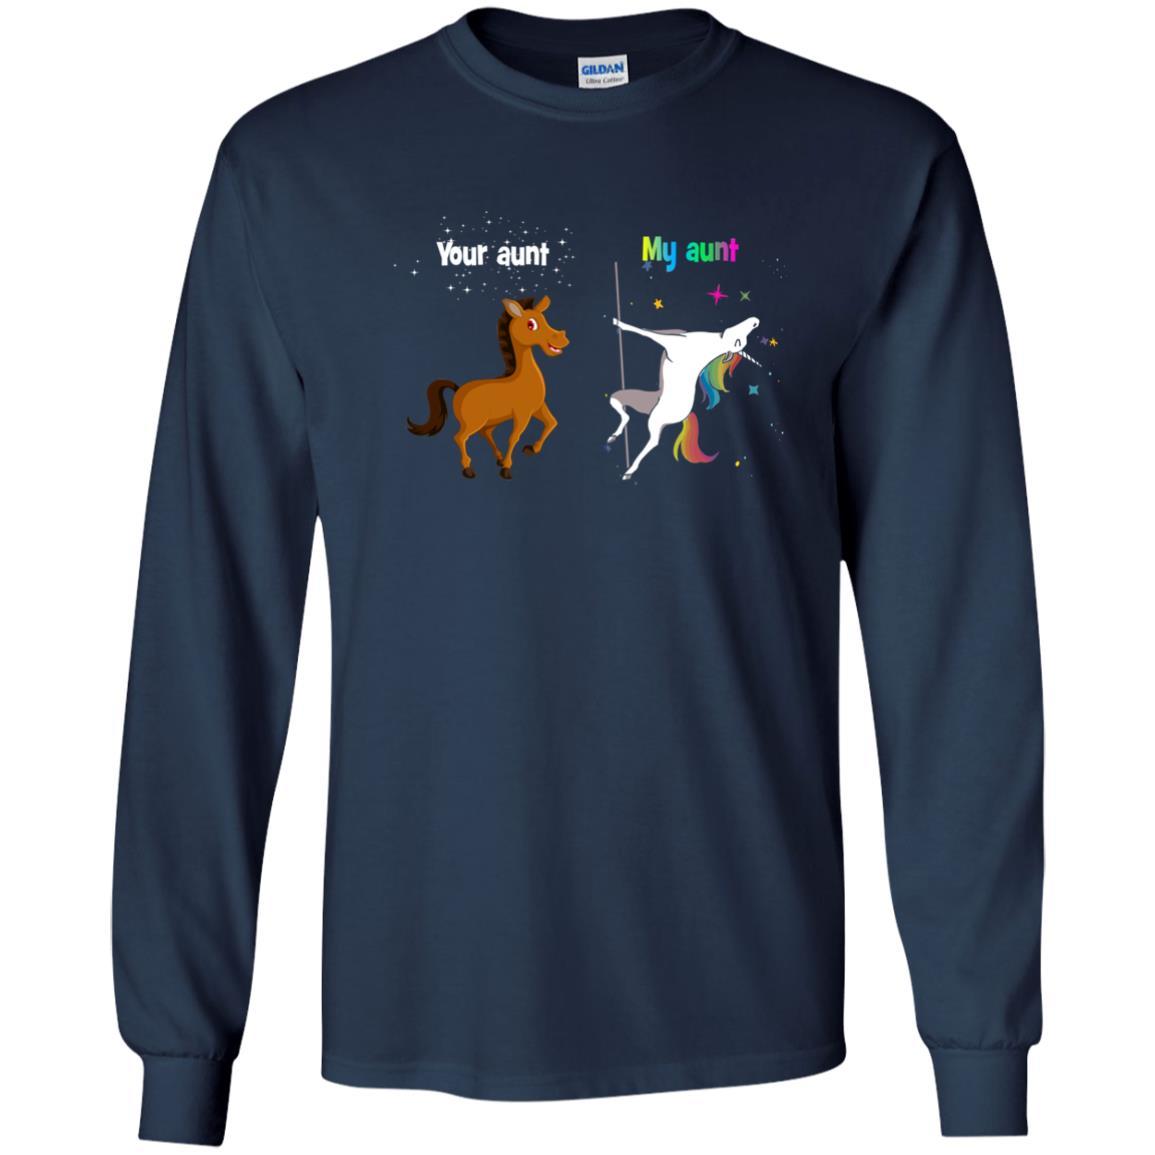 image 966px My aunt unicorn vs your aunt horse youth t shirt